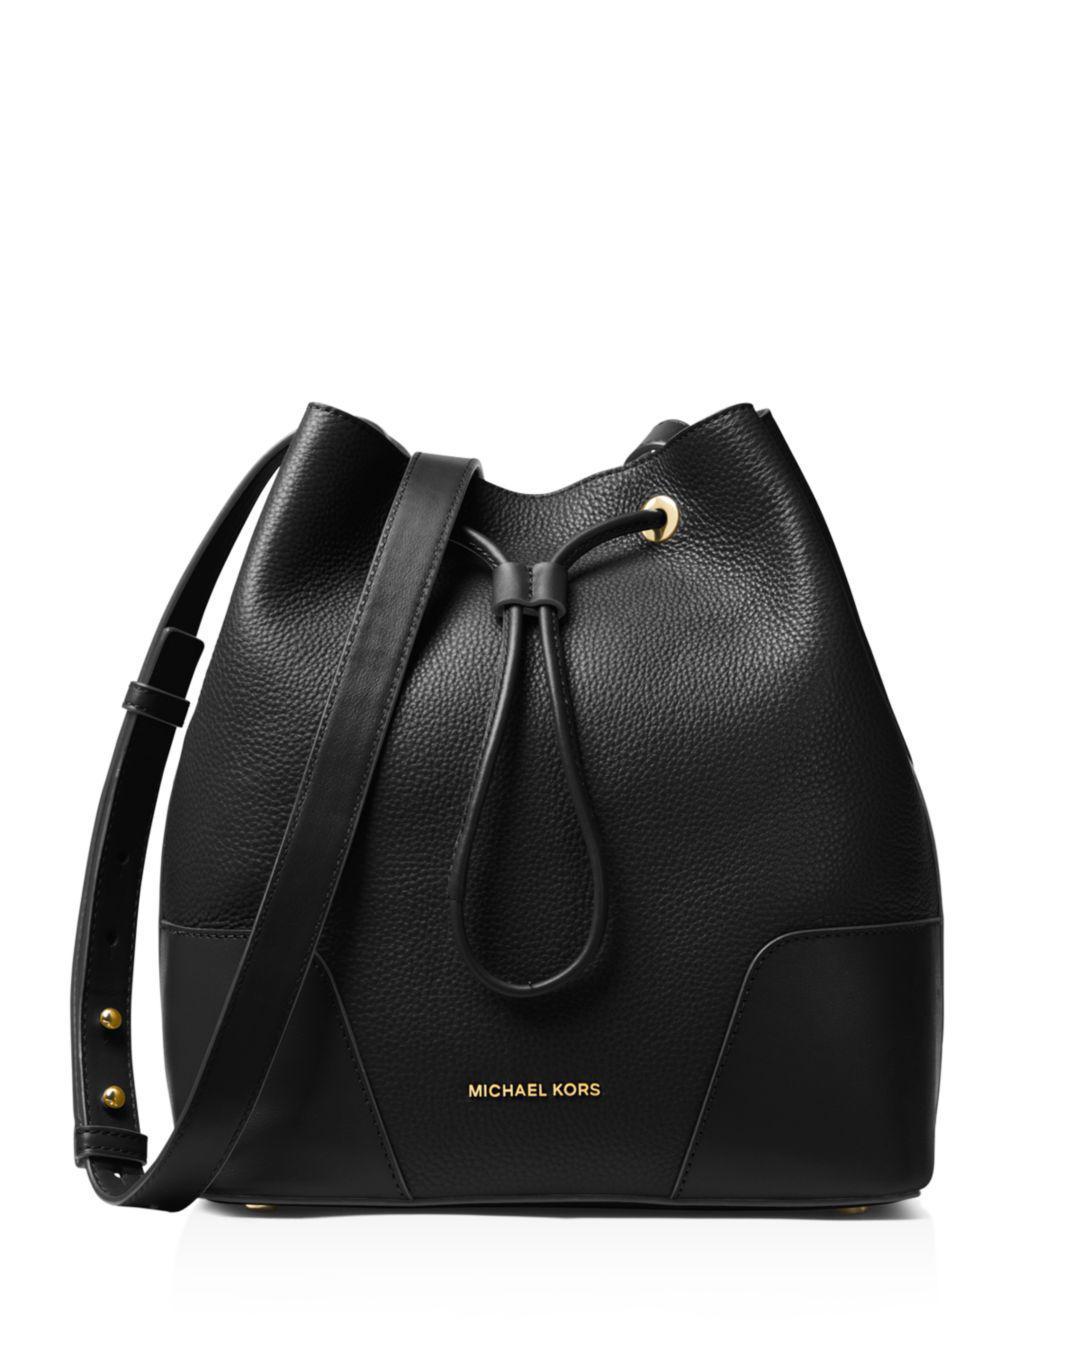 213487ebb0fa16 Michael Kors - Black Cary Medium Pebbled Leather Bucket Bag - Lyst. View  fullscreen